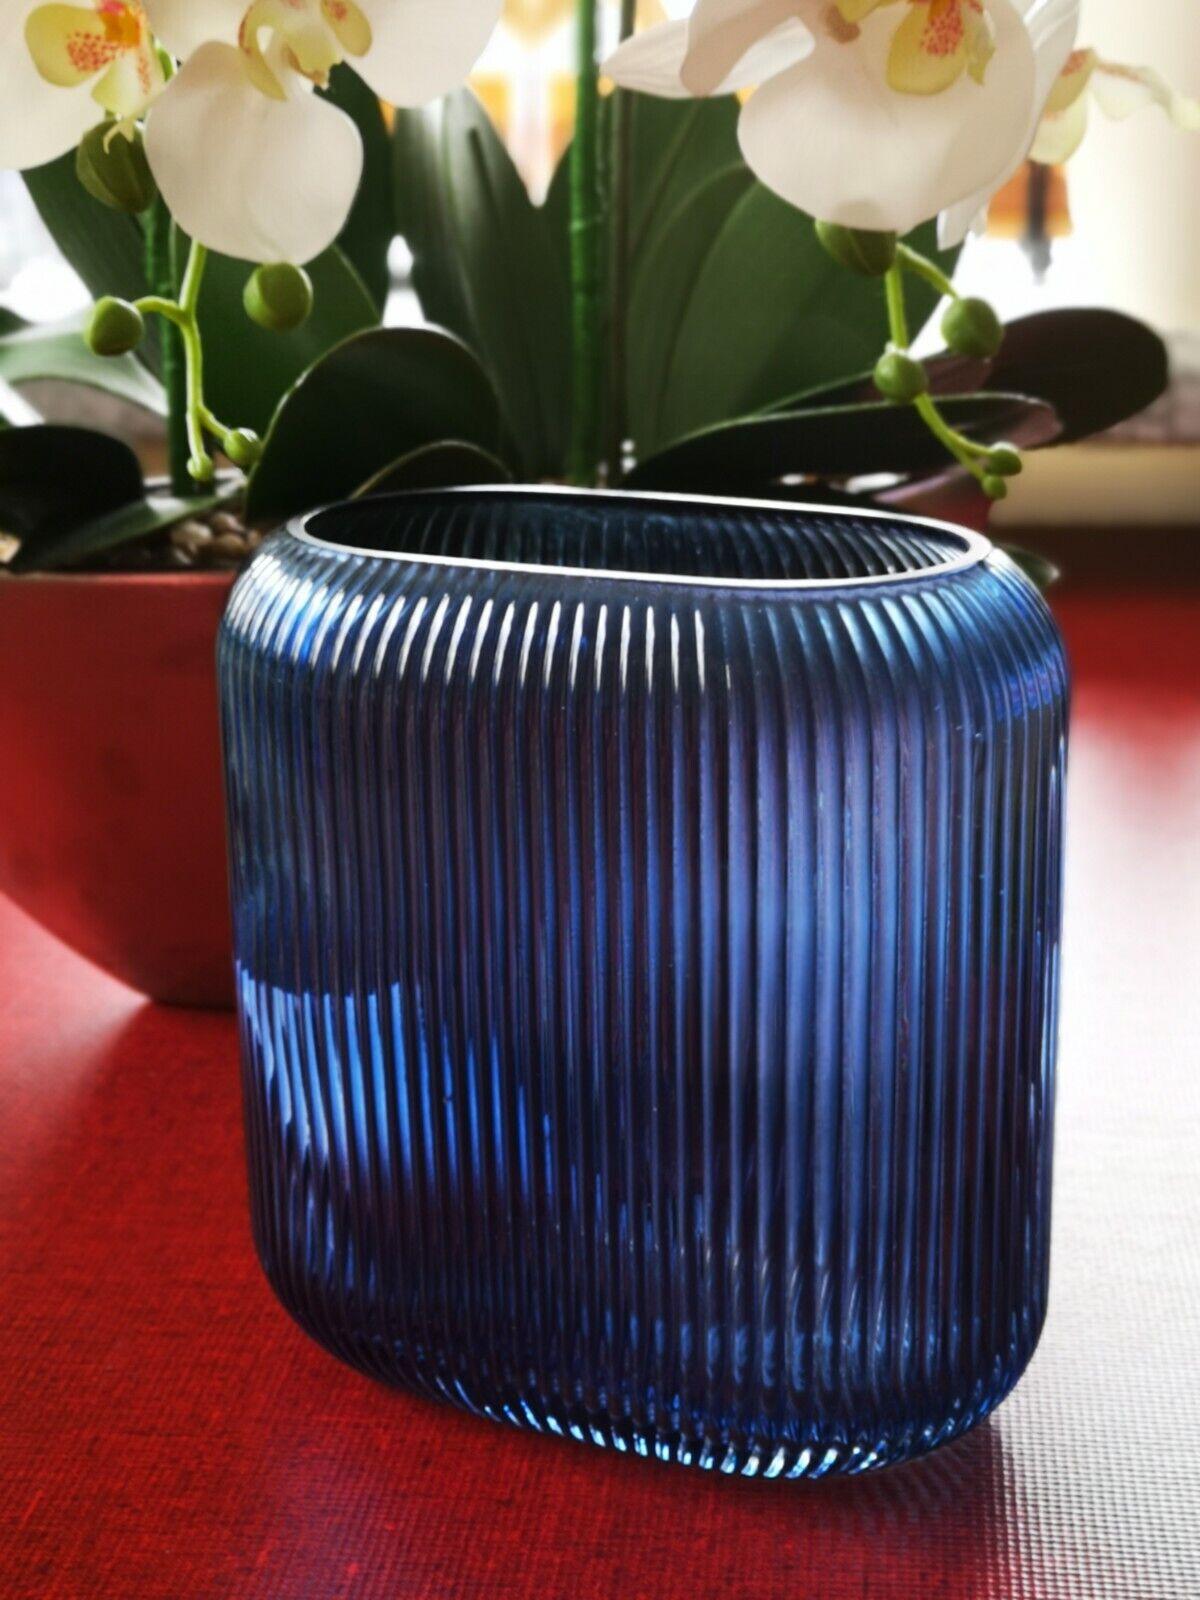 Vase, Glasvase, Rillenvase in ovaler Form mit blauem Farbglas, 17 x 17 x 7 cm